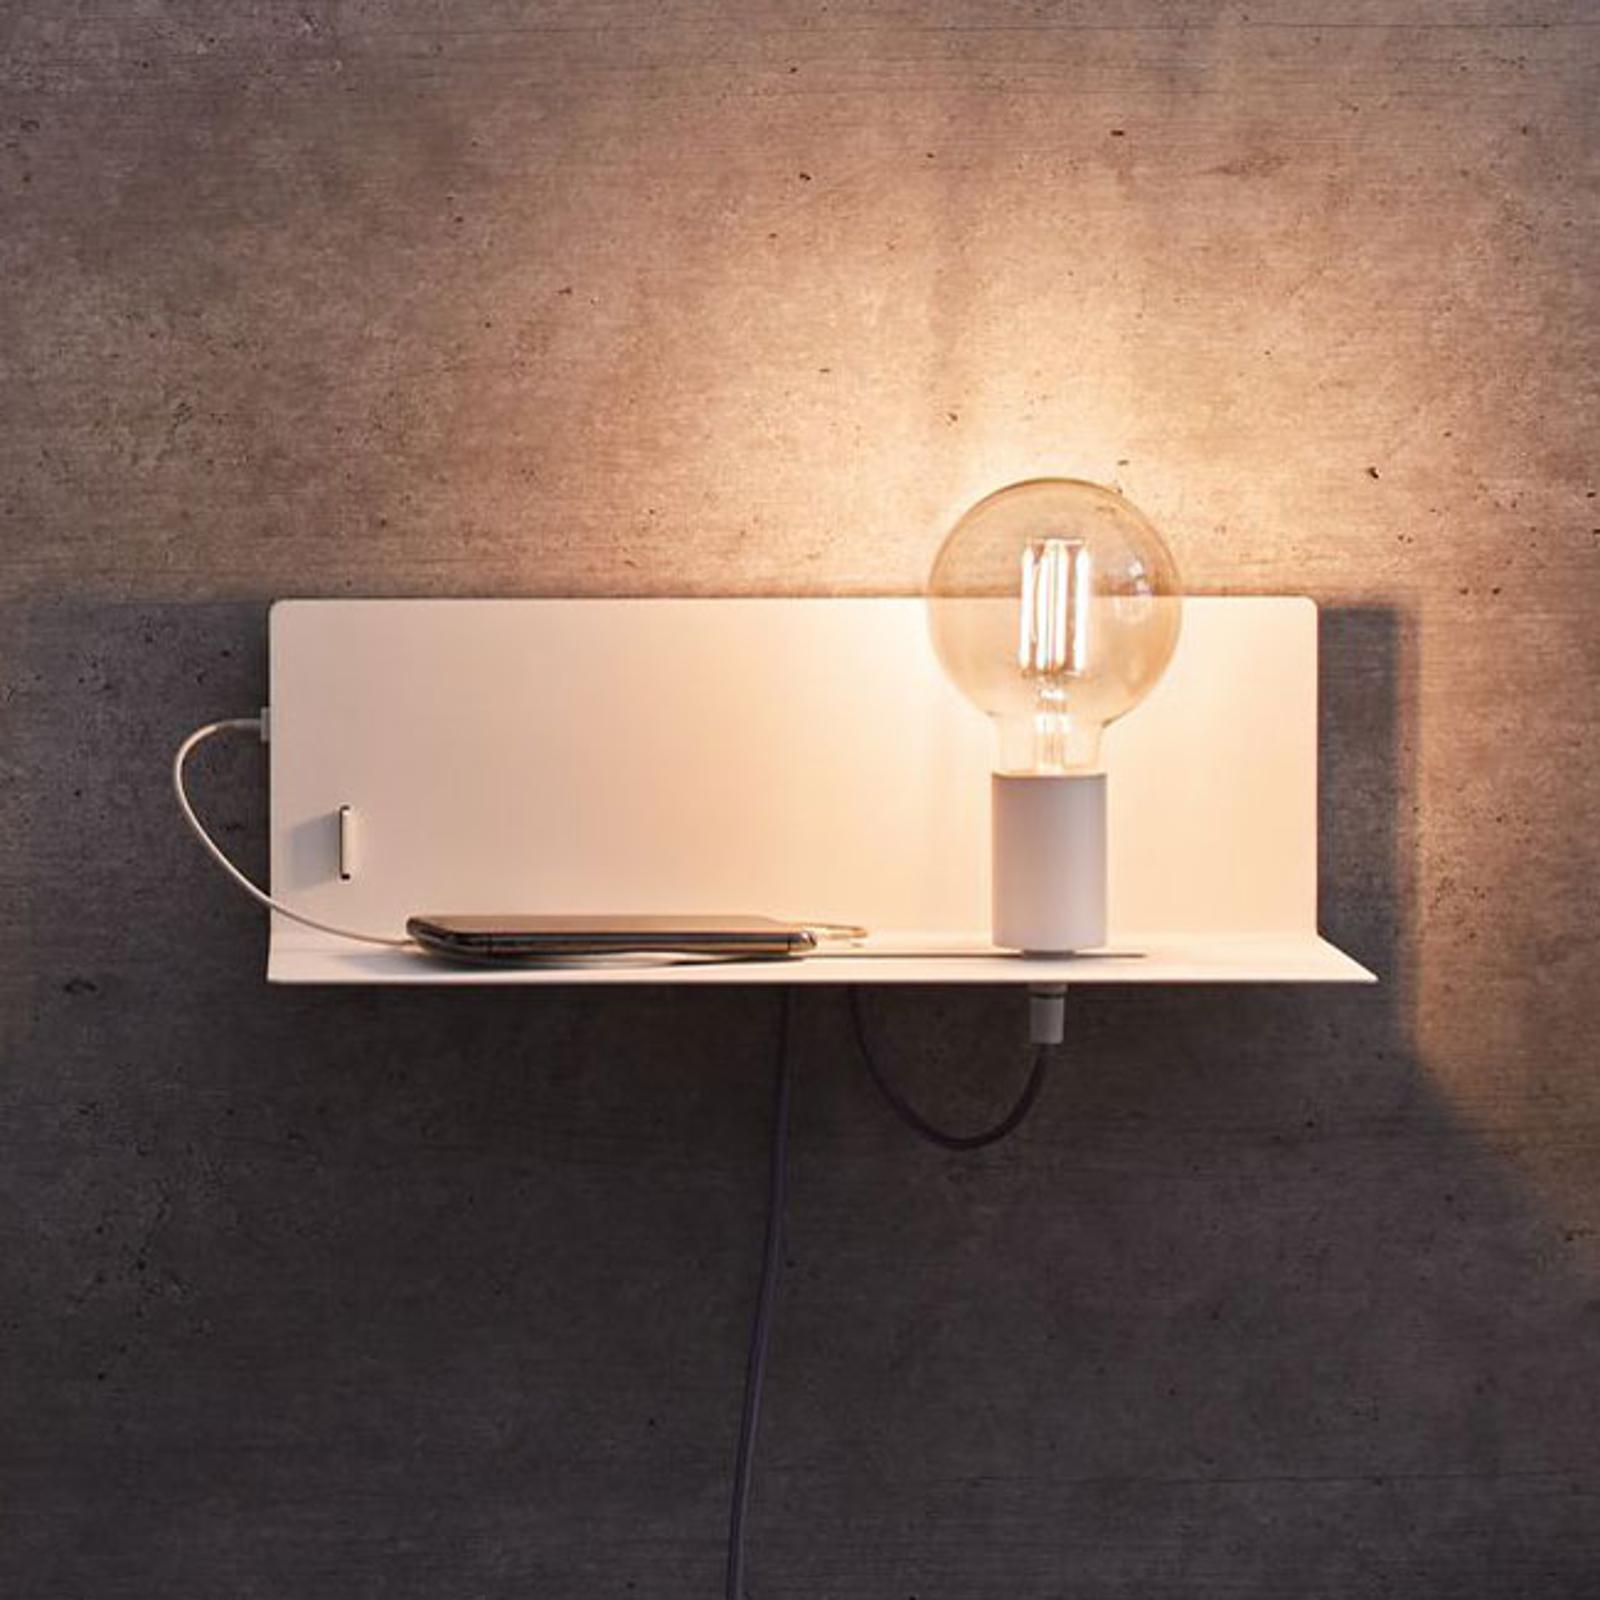 Paulmann Devara wandlamp met legbord, wit